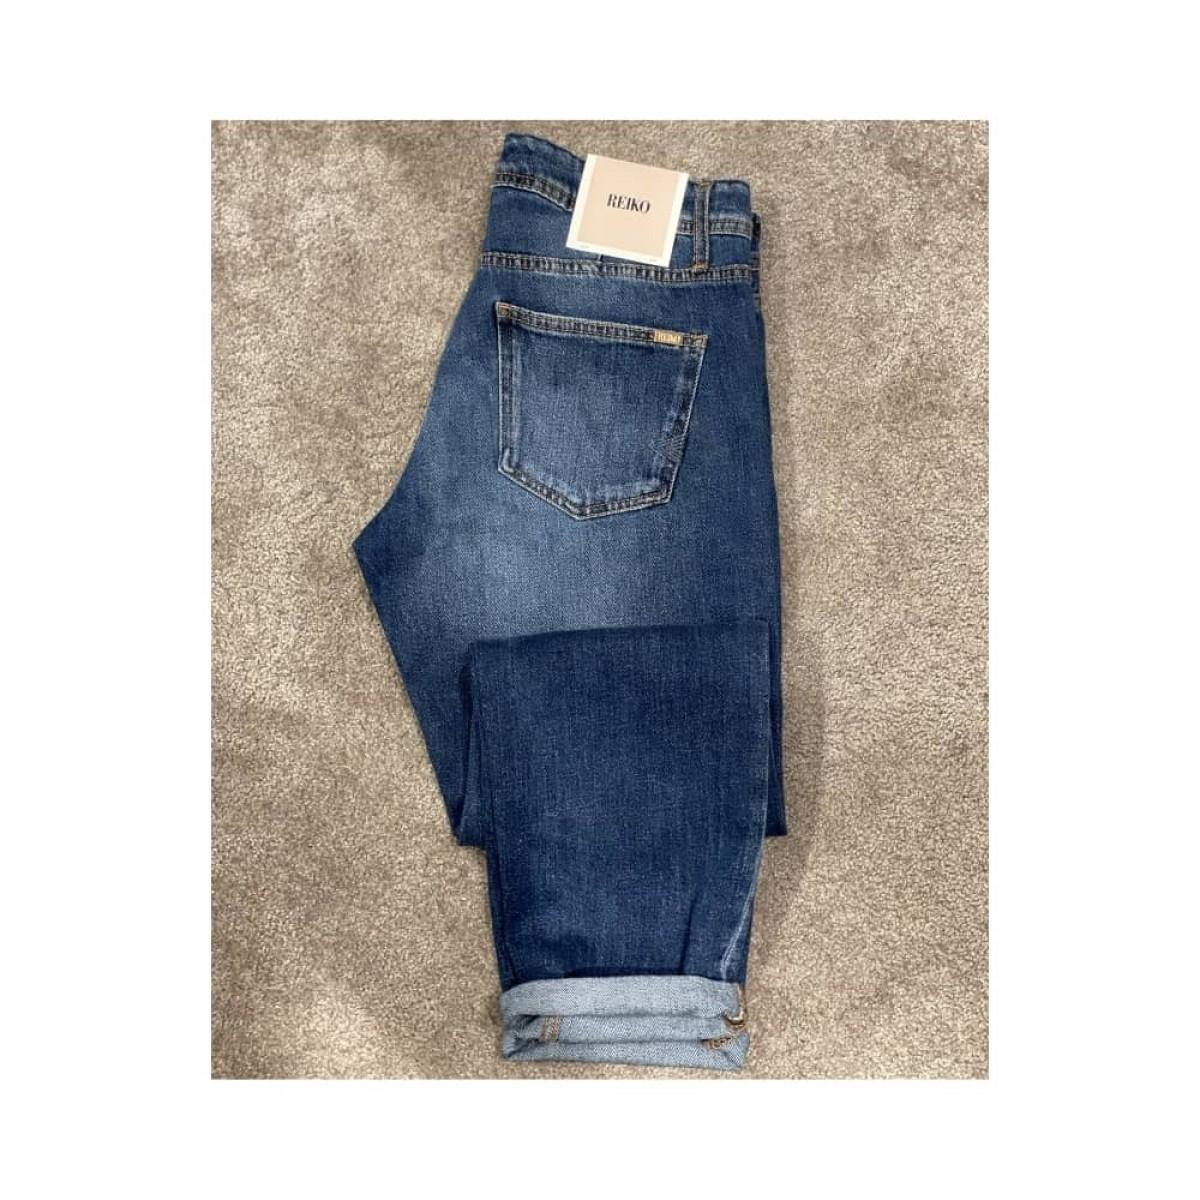 nina boyfriend jeans - denim blue - baglomme